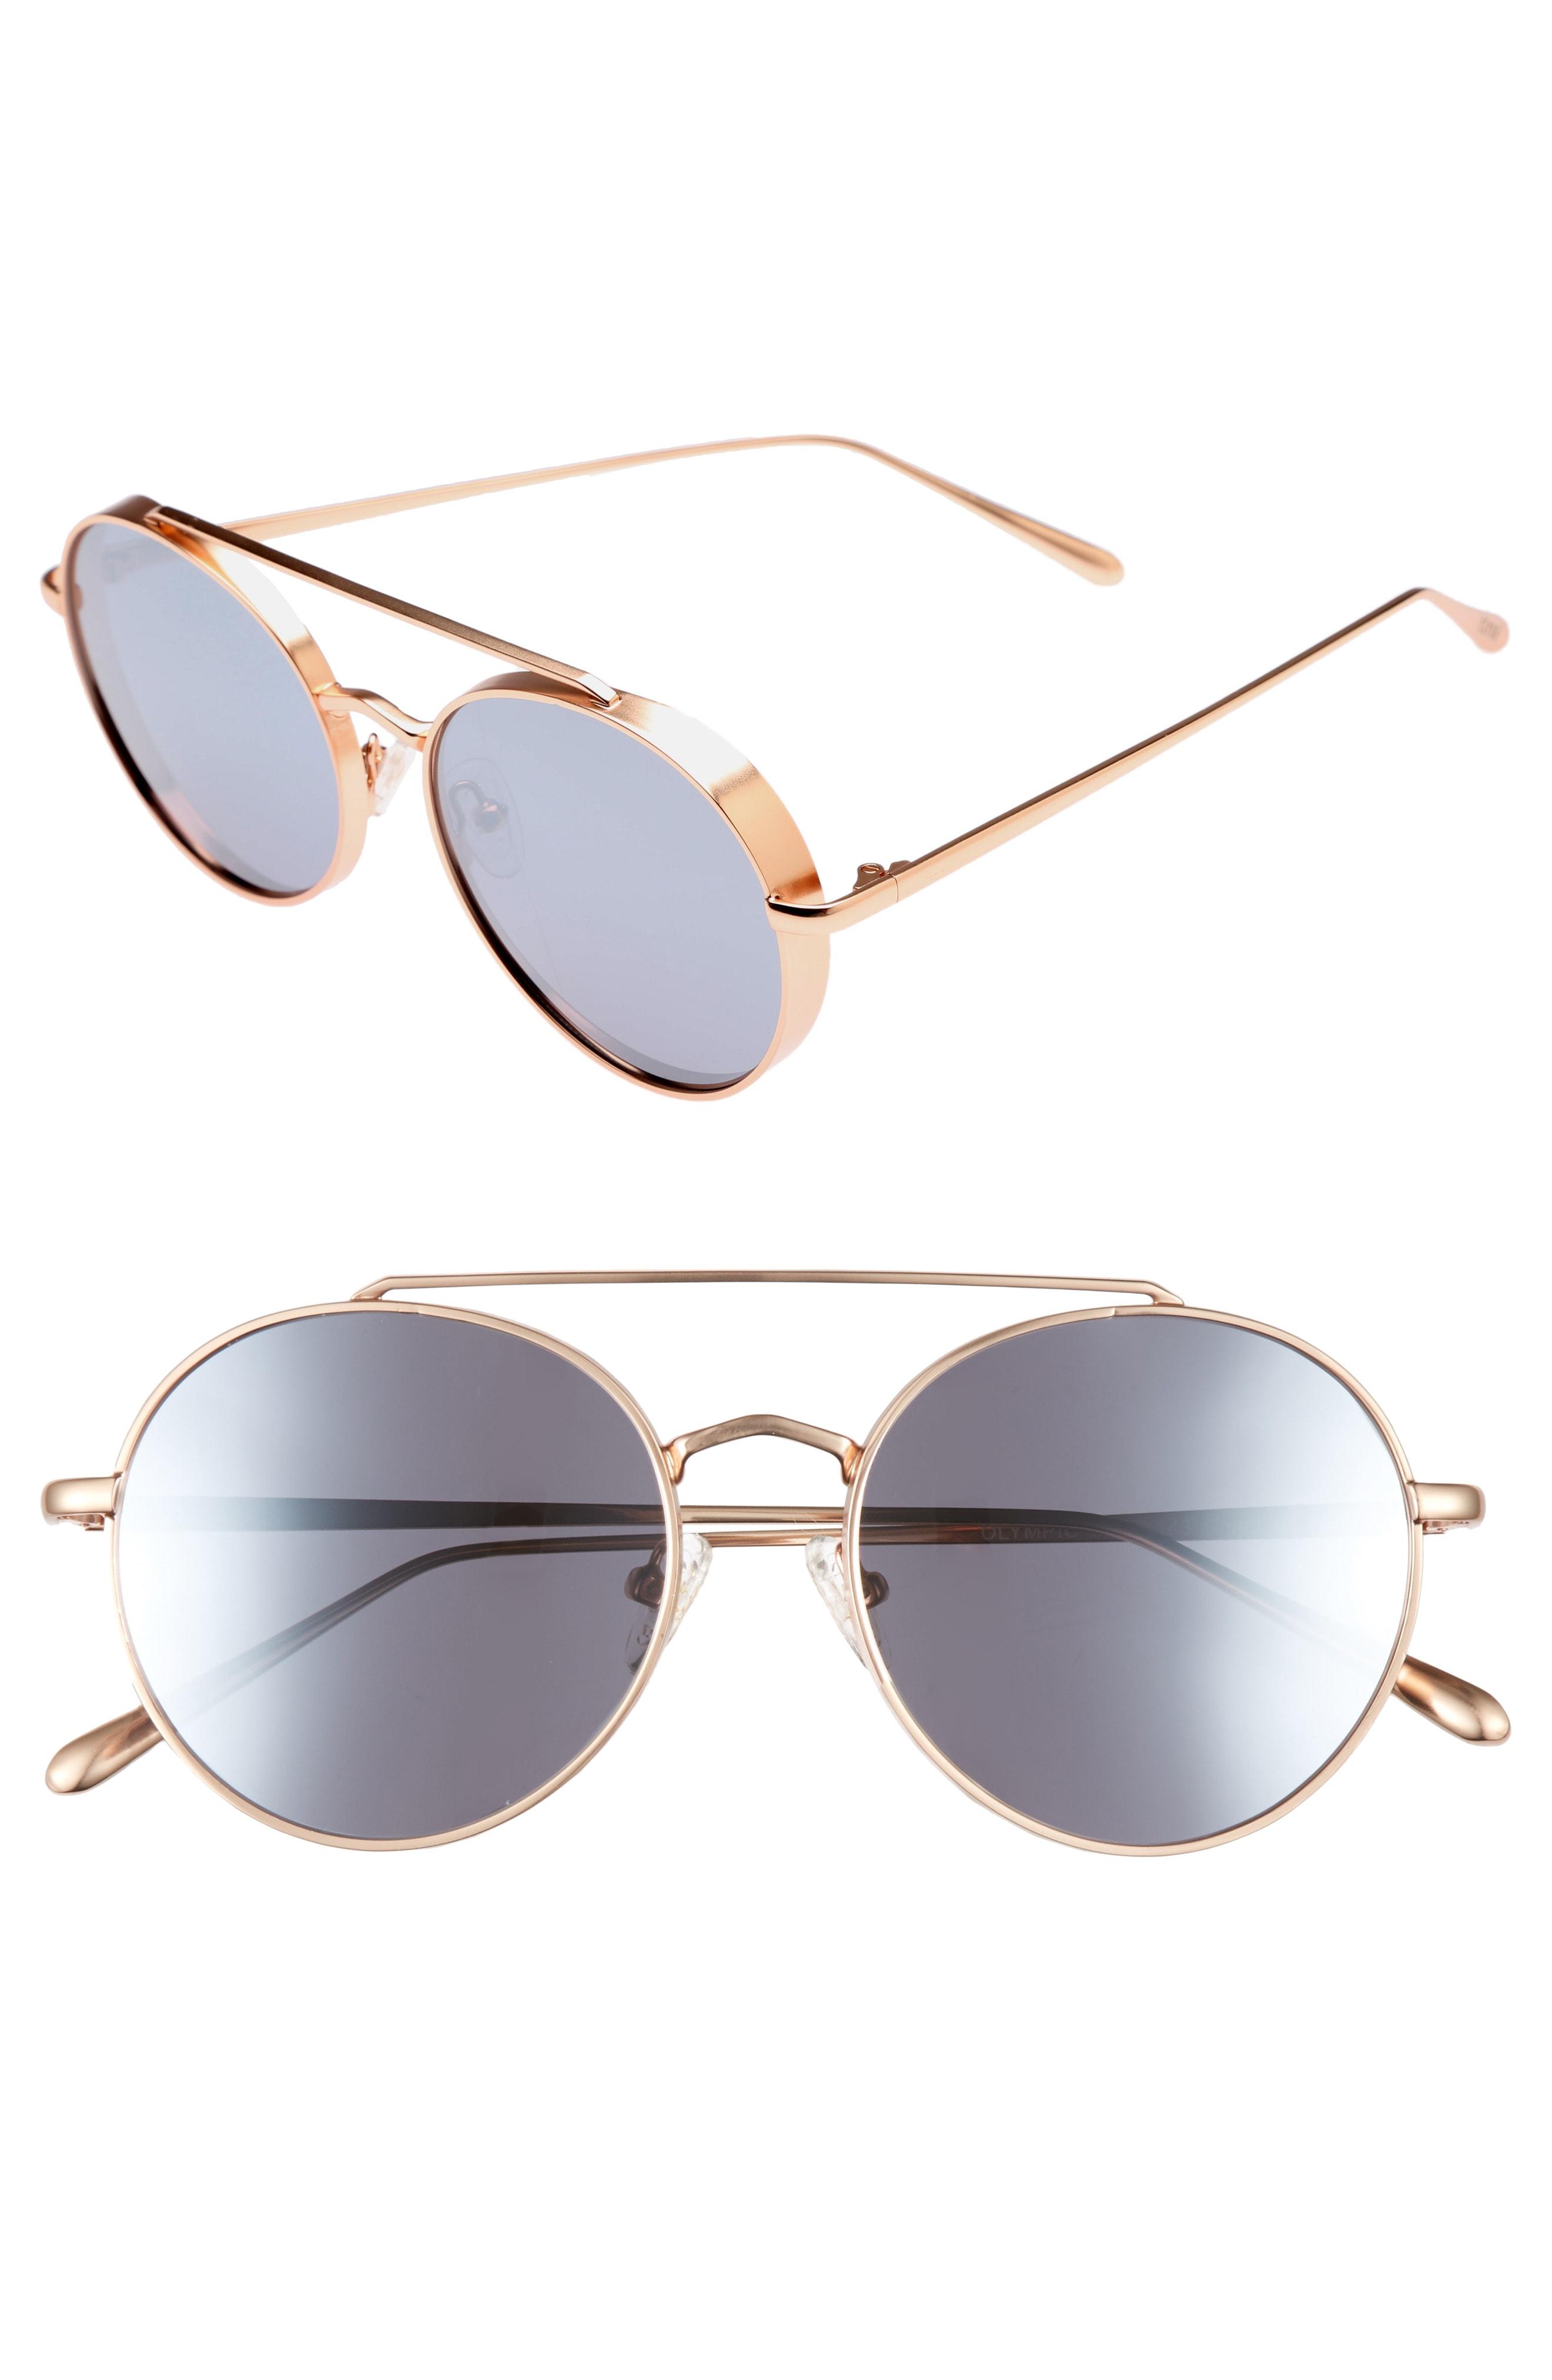 Bonnie Clyde Olympic 53mm Polarized Aviator Sunglasses